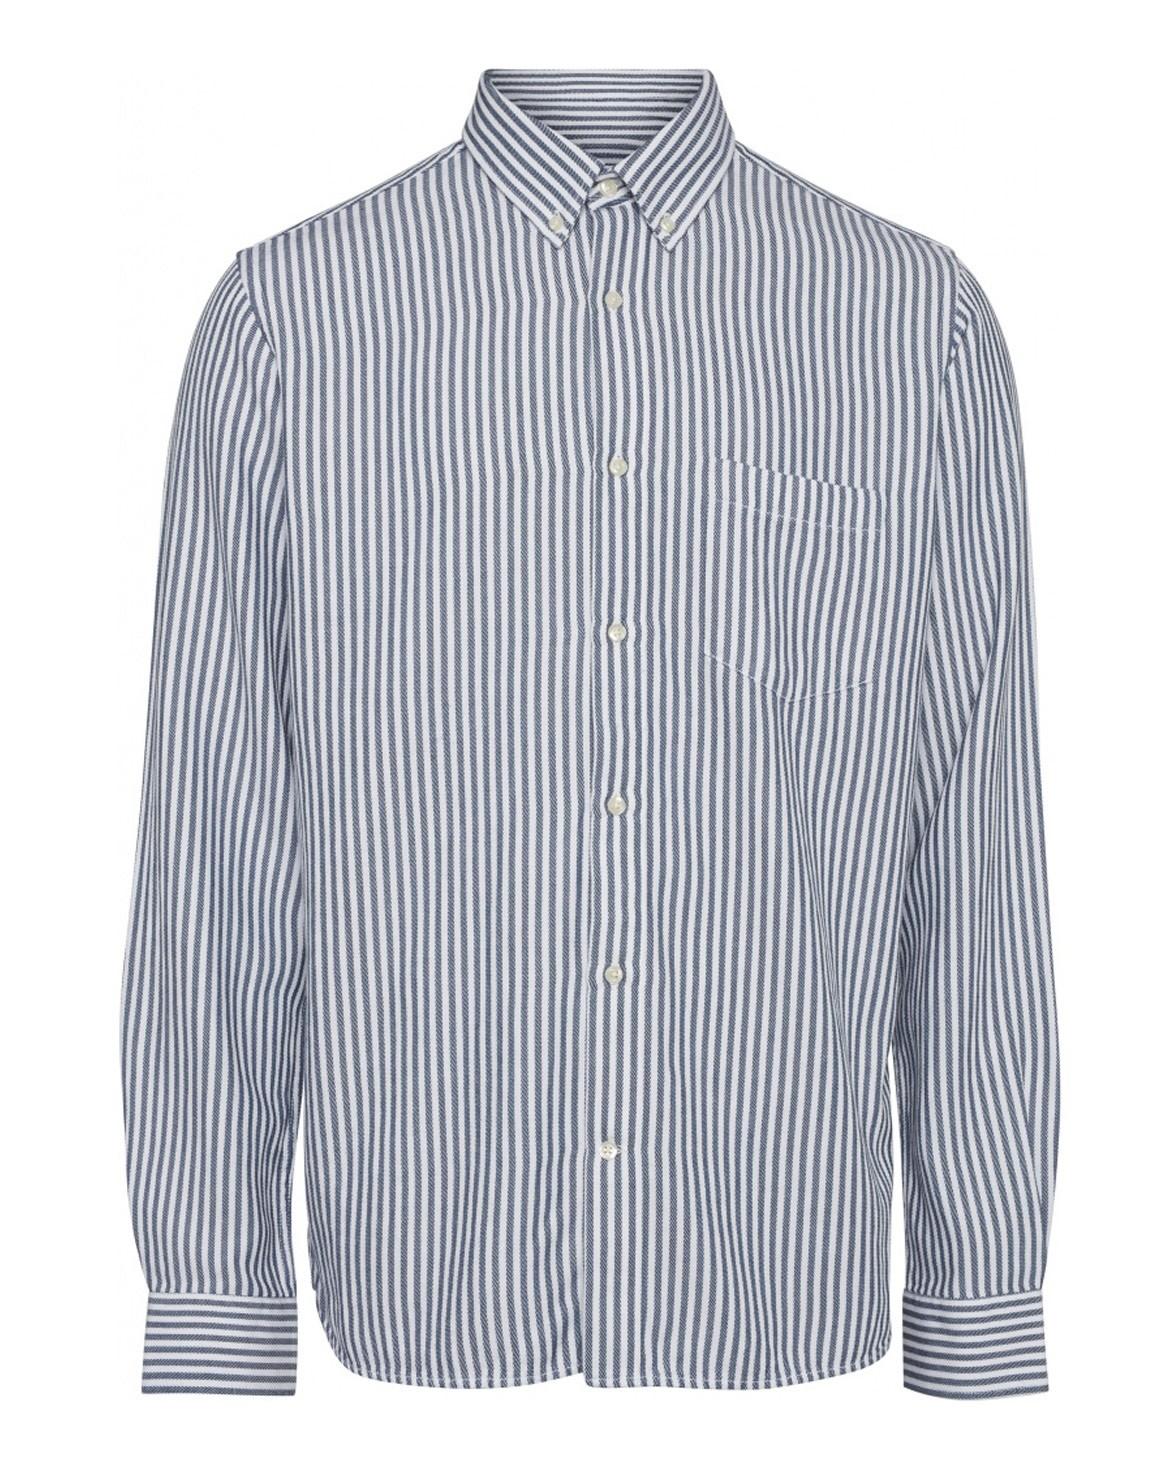 Elder Striped Hemd